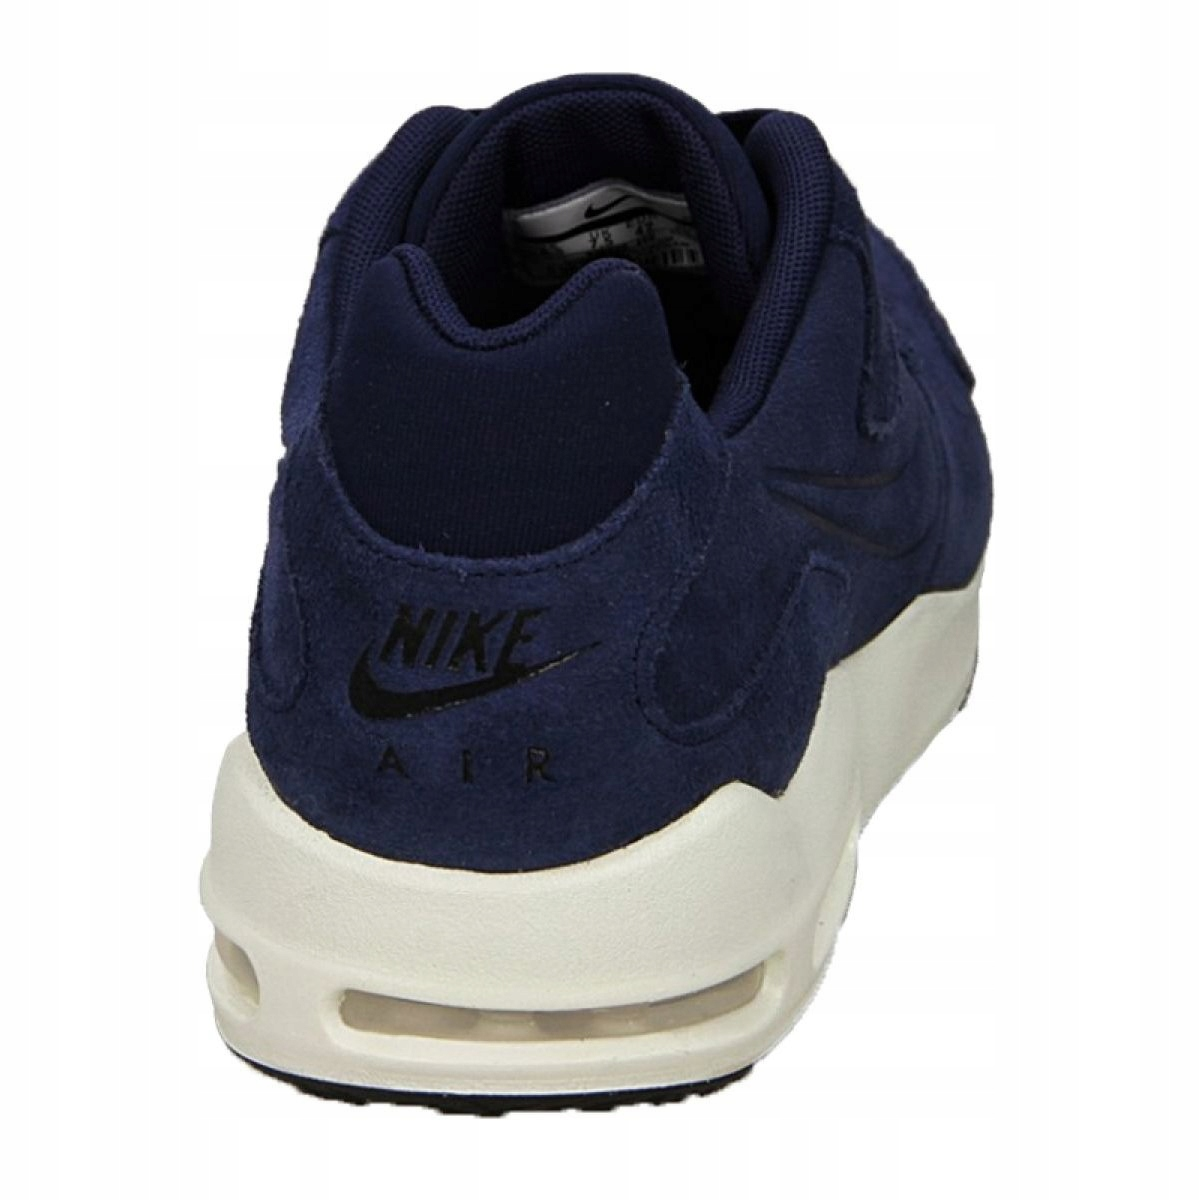 Buty Nike Air Max Guile Prime M 916770 r.42,5